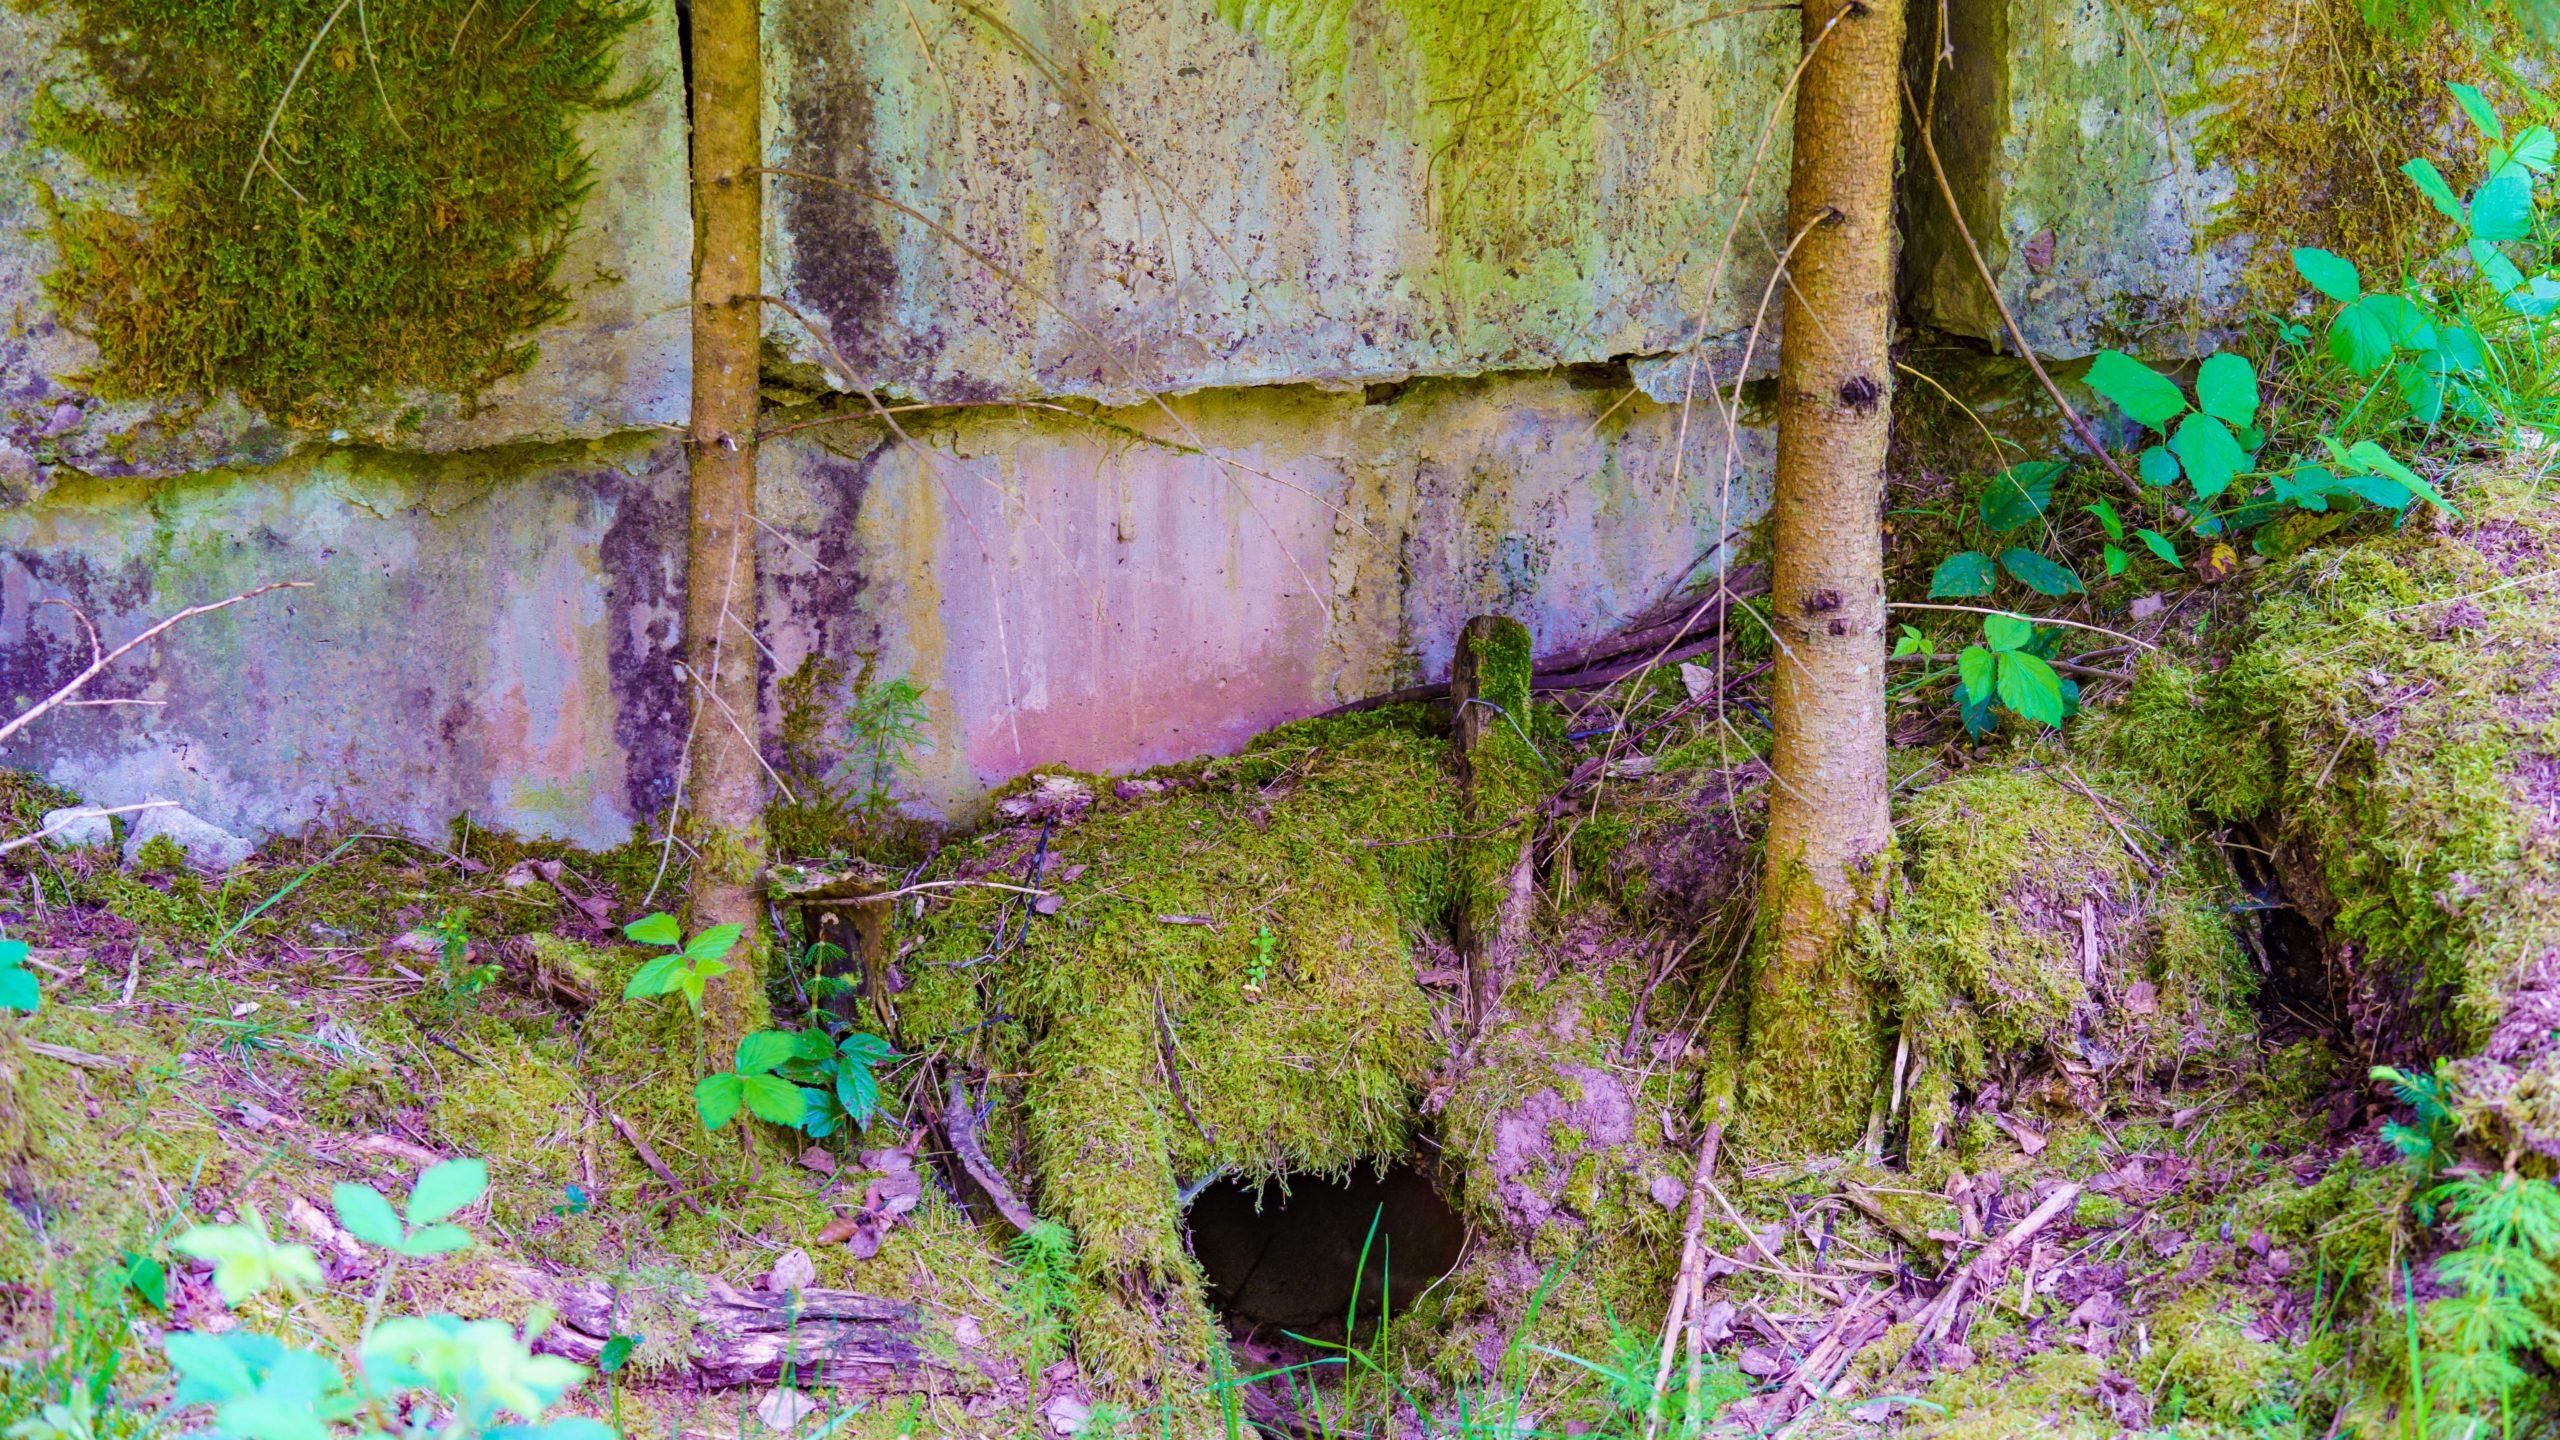 Grenzweg Gerstunger Forst, (geheimnisvolle) Rückstände technischer Maßnahmen im Blankenbacher Tal